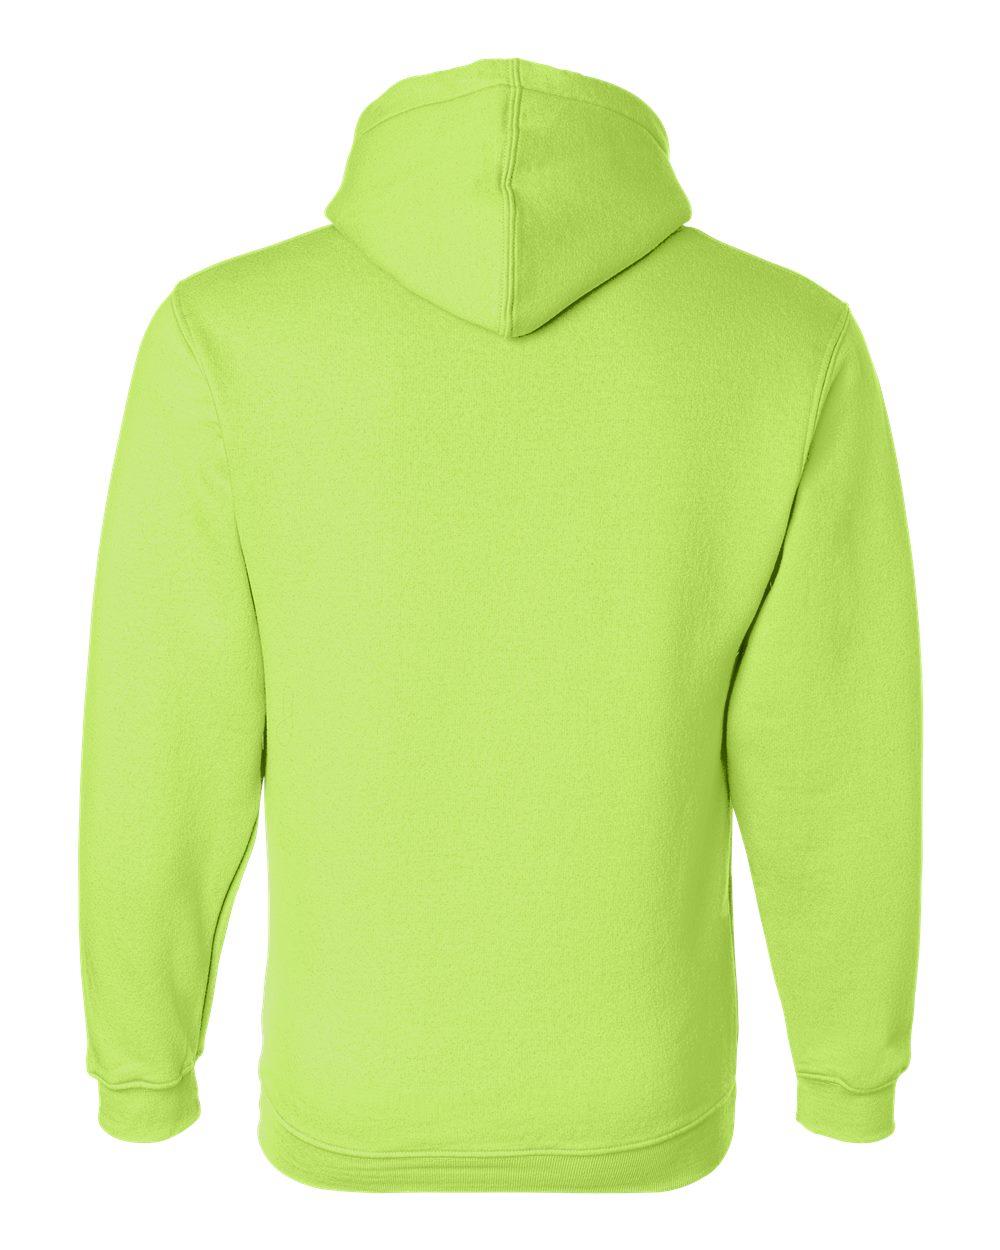 Bayside-Mens-Blank-USA-Made-Hooded-Sweatshirt-960-up-to-6XL miniature 19